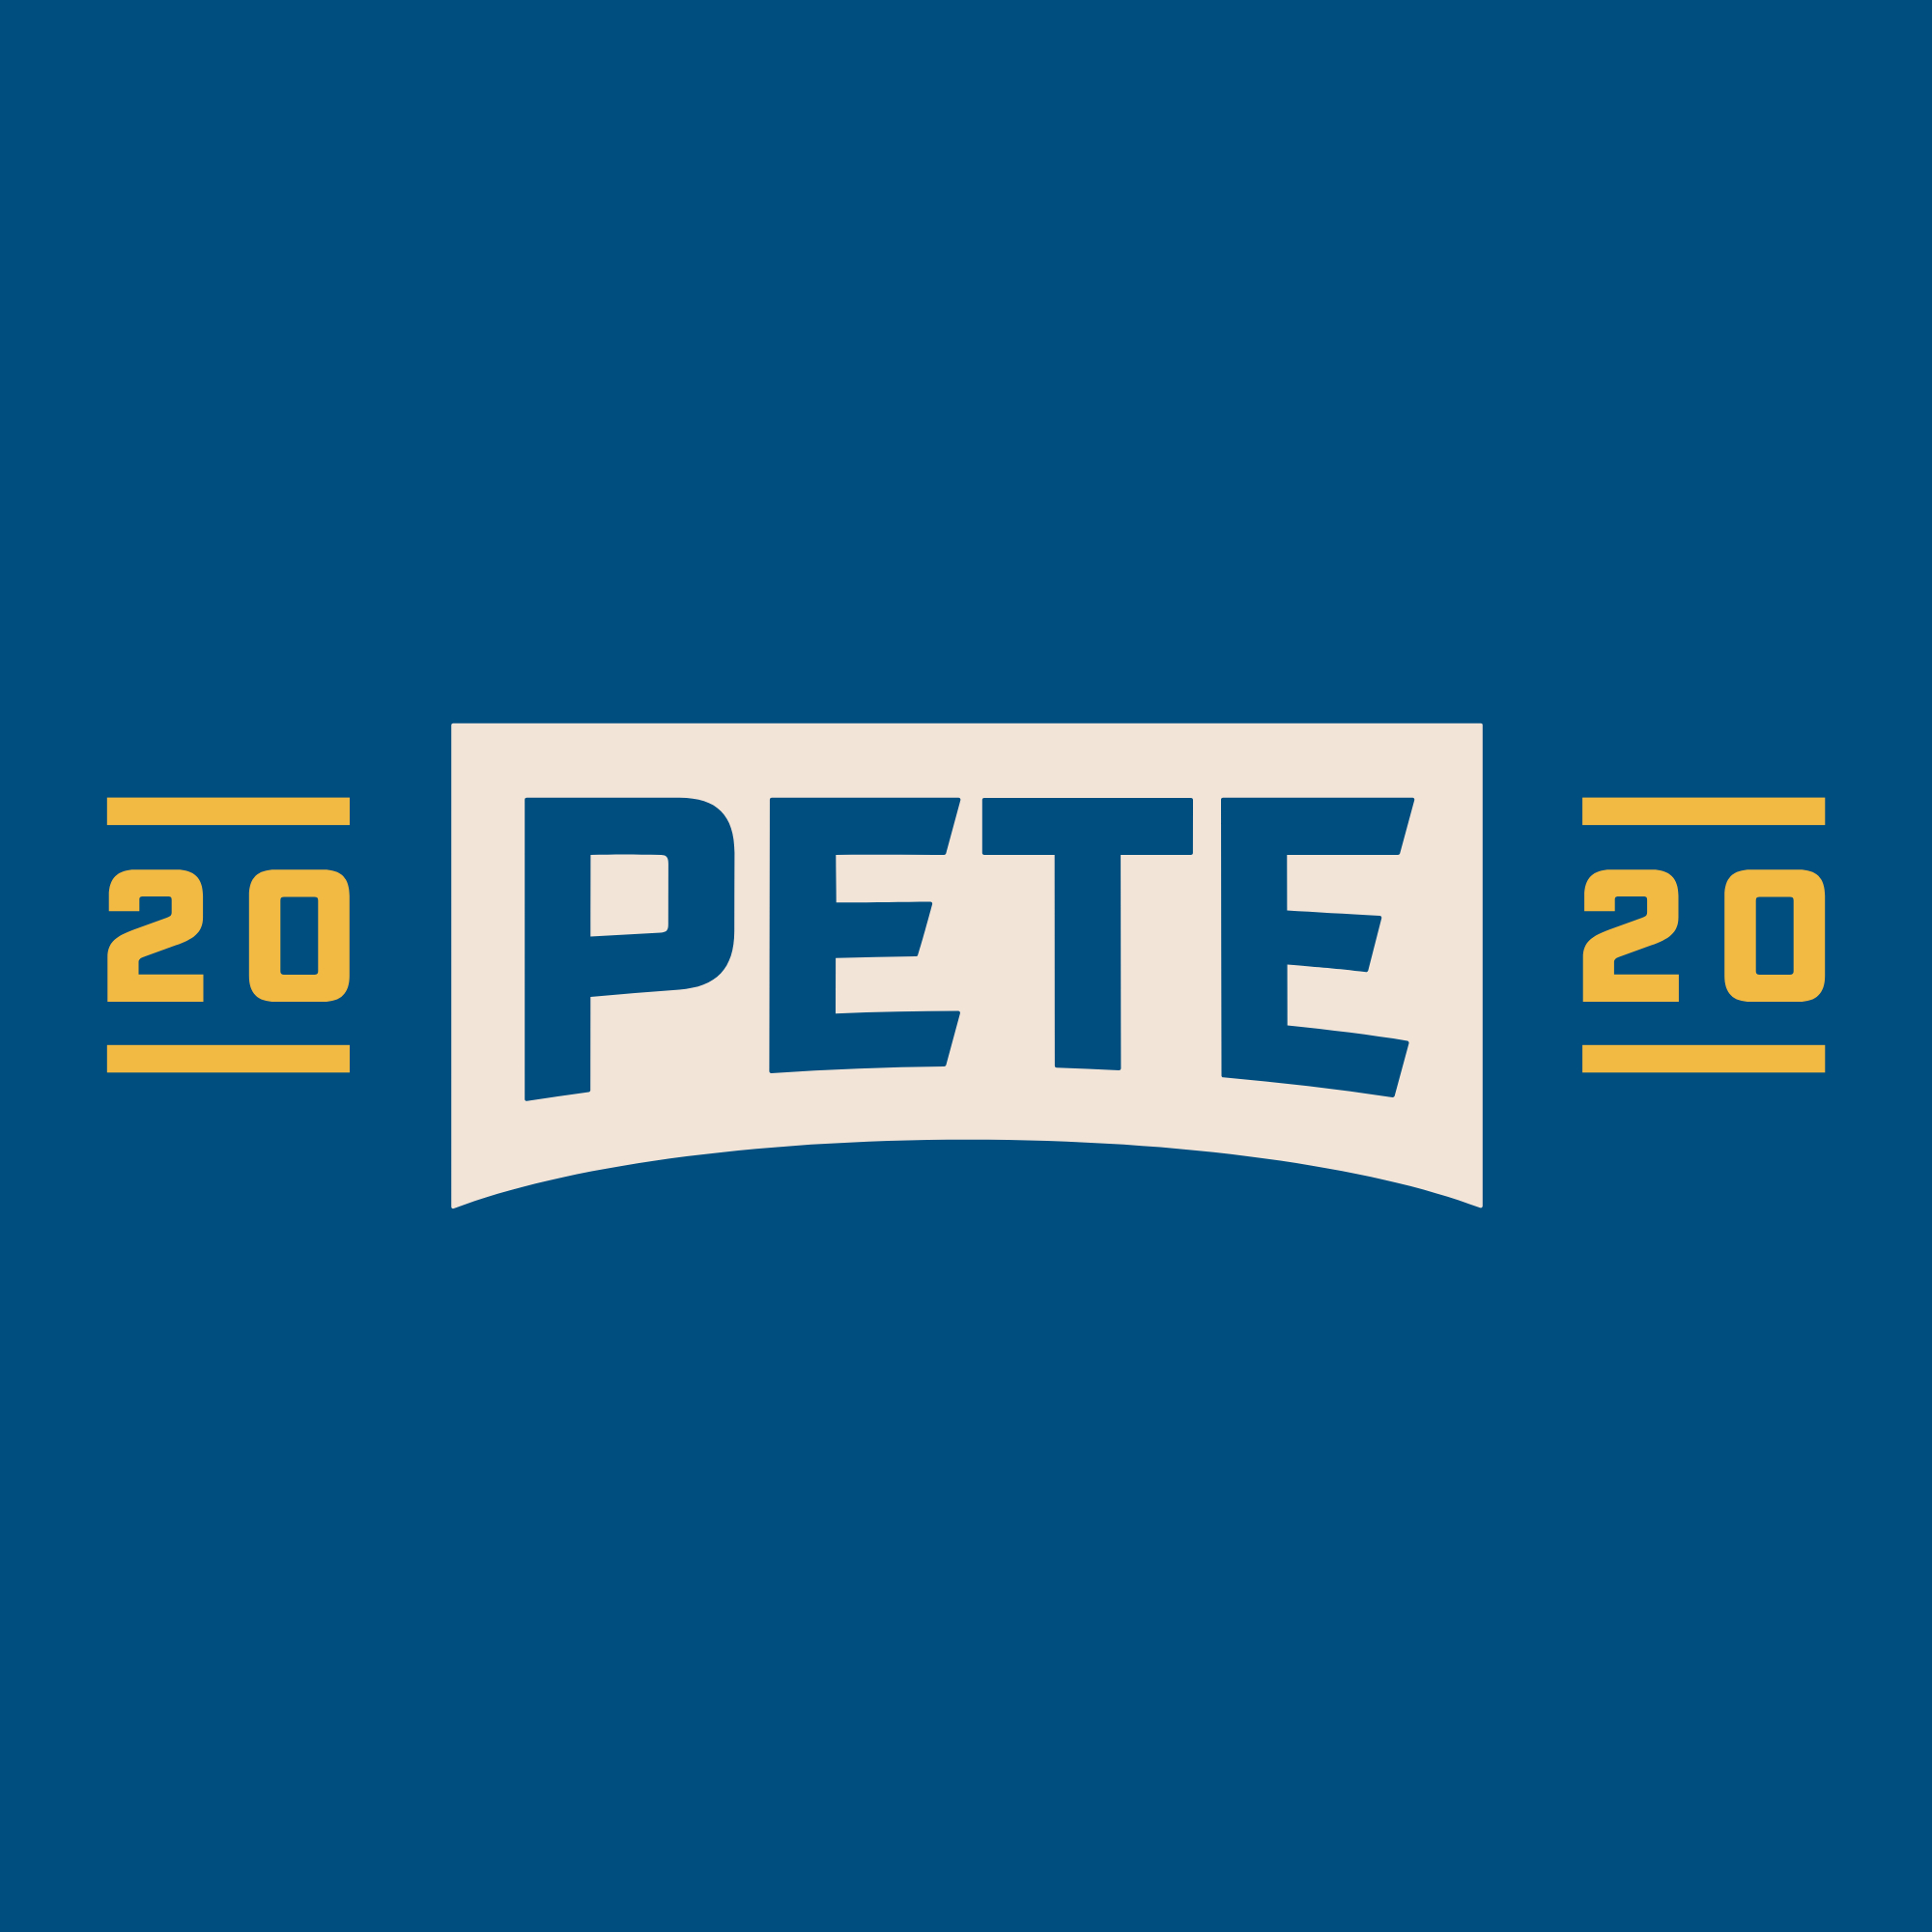 Pete Bridge 2020.jpg